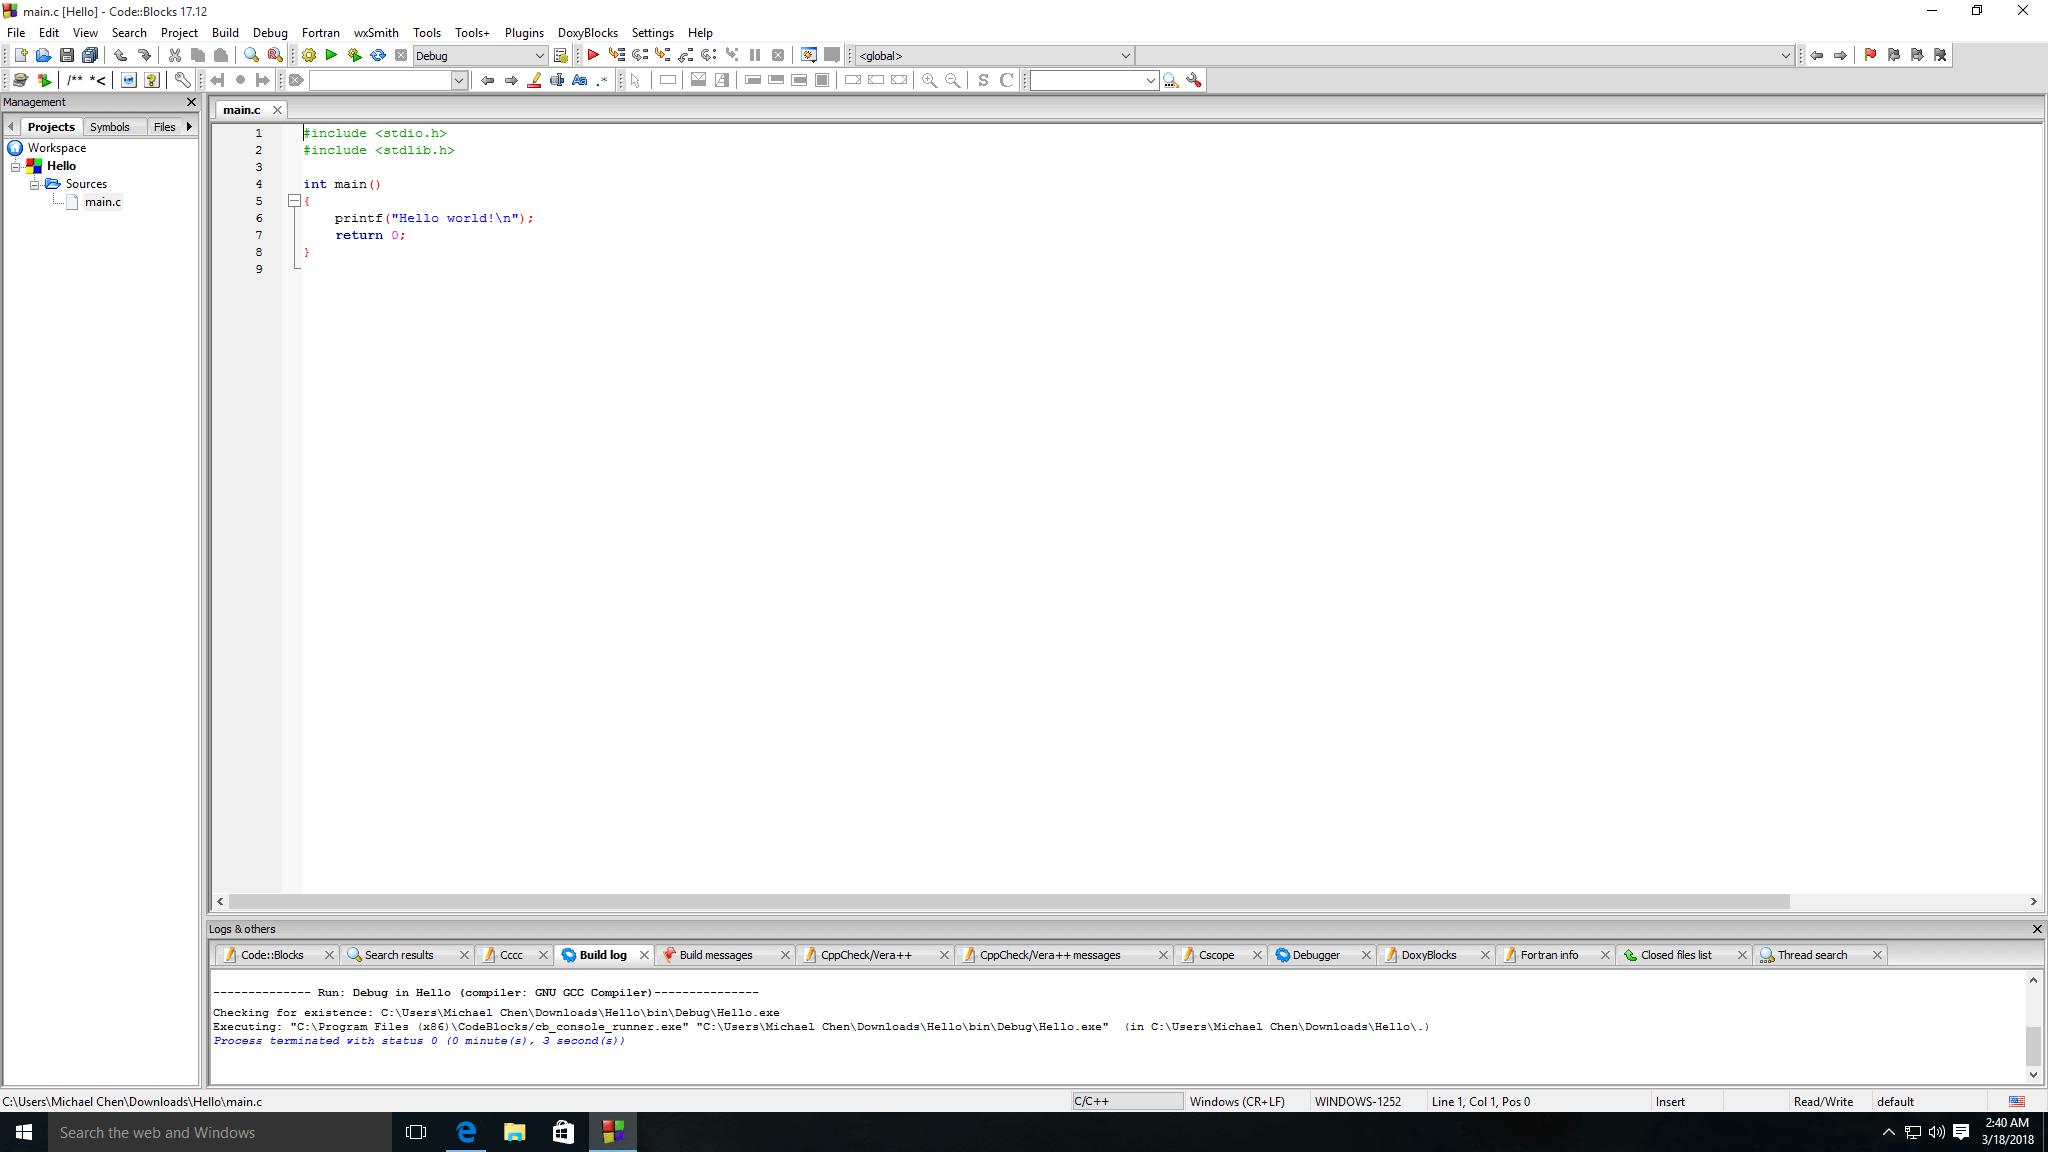 Code::Blocks 編輯器主畫面